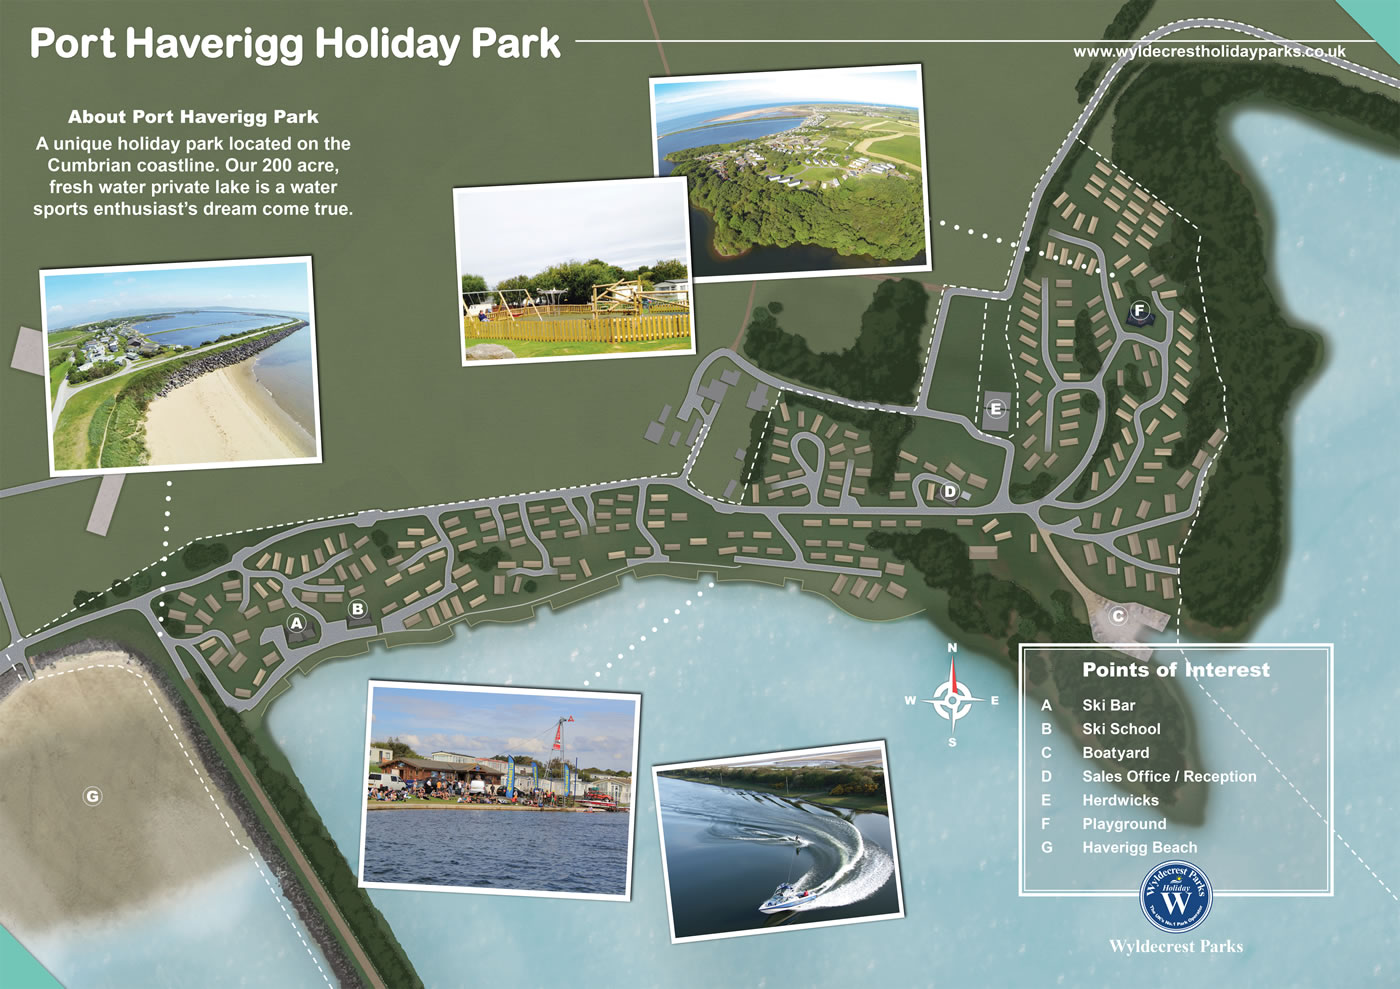 Port Haverigg Holiday Park Map